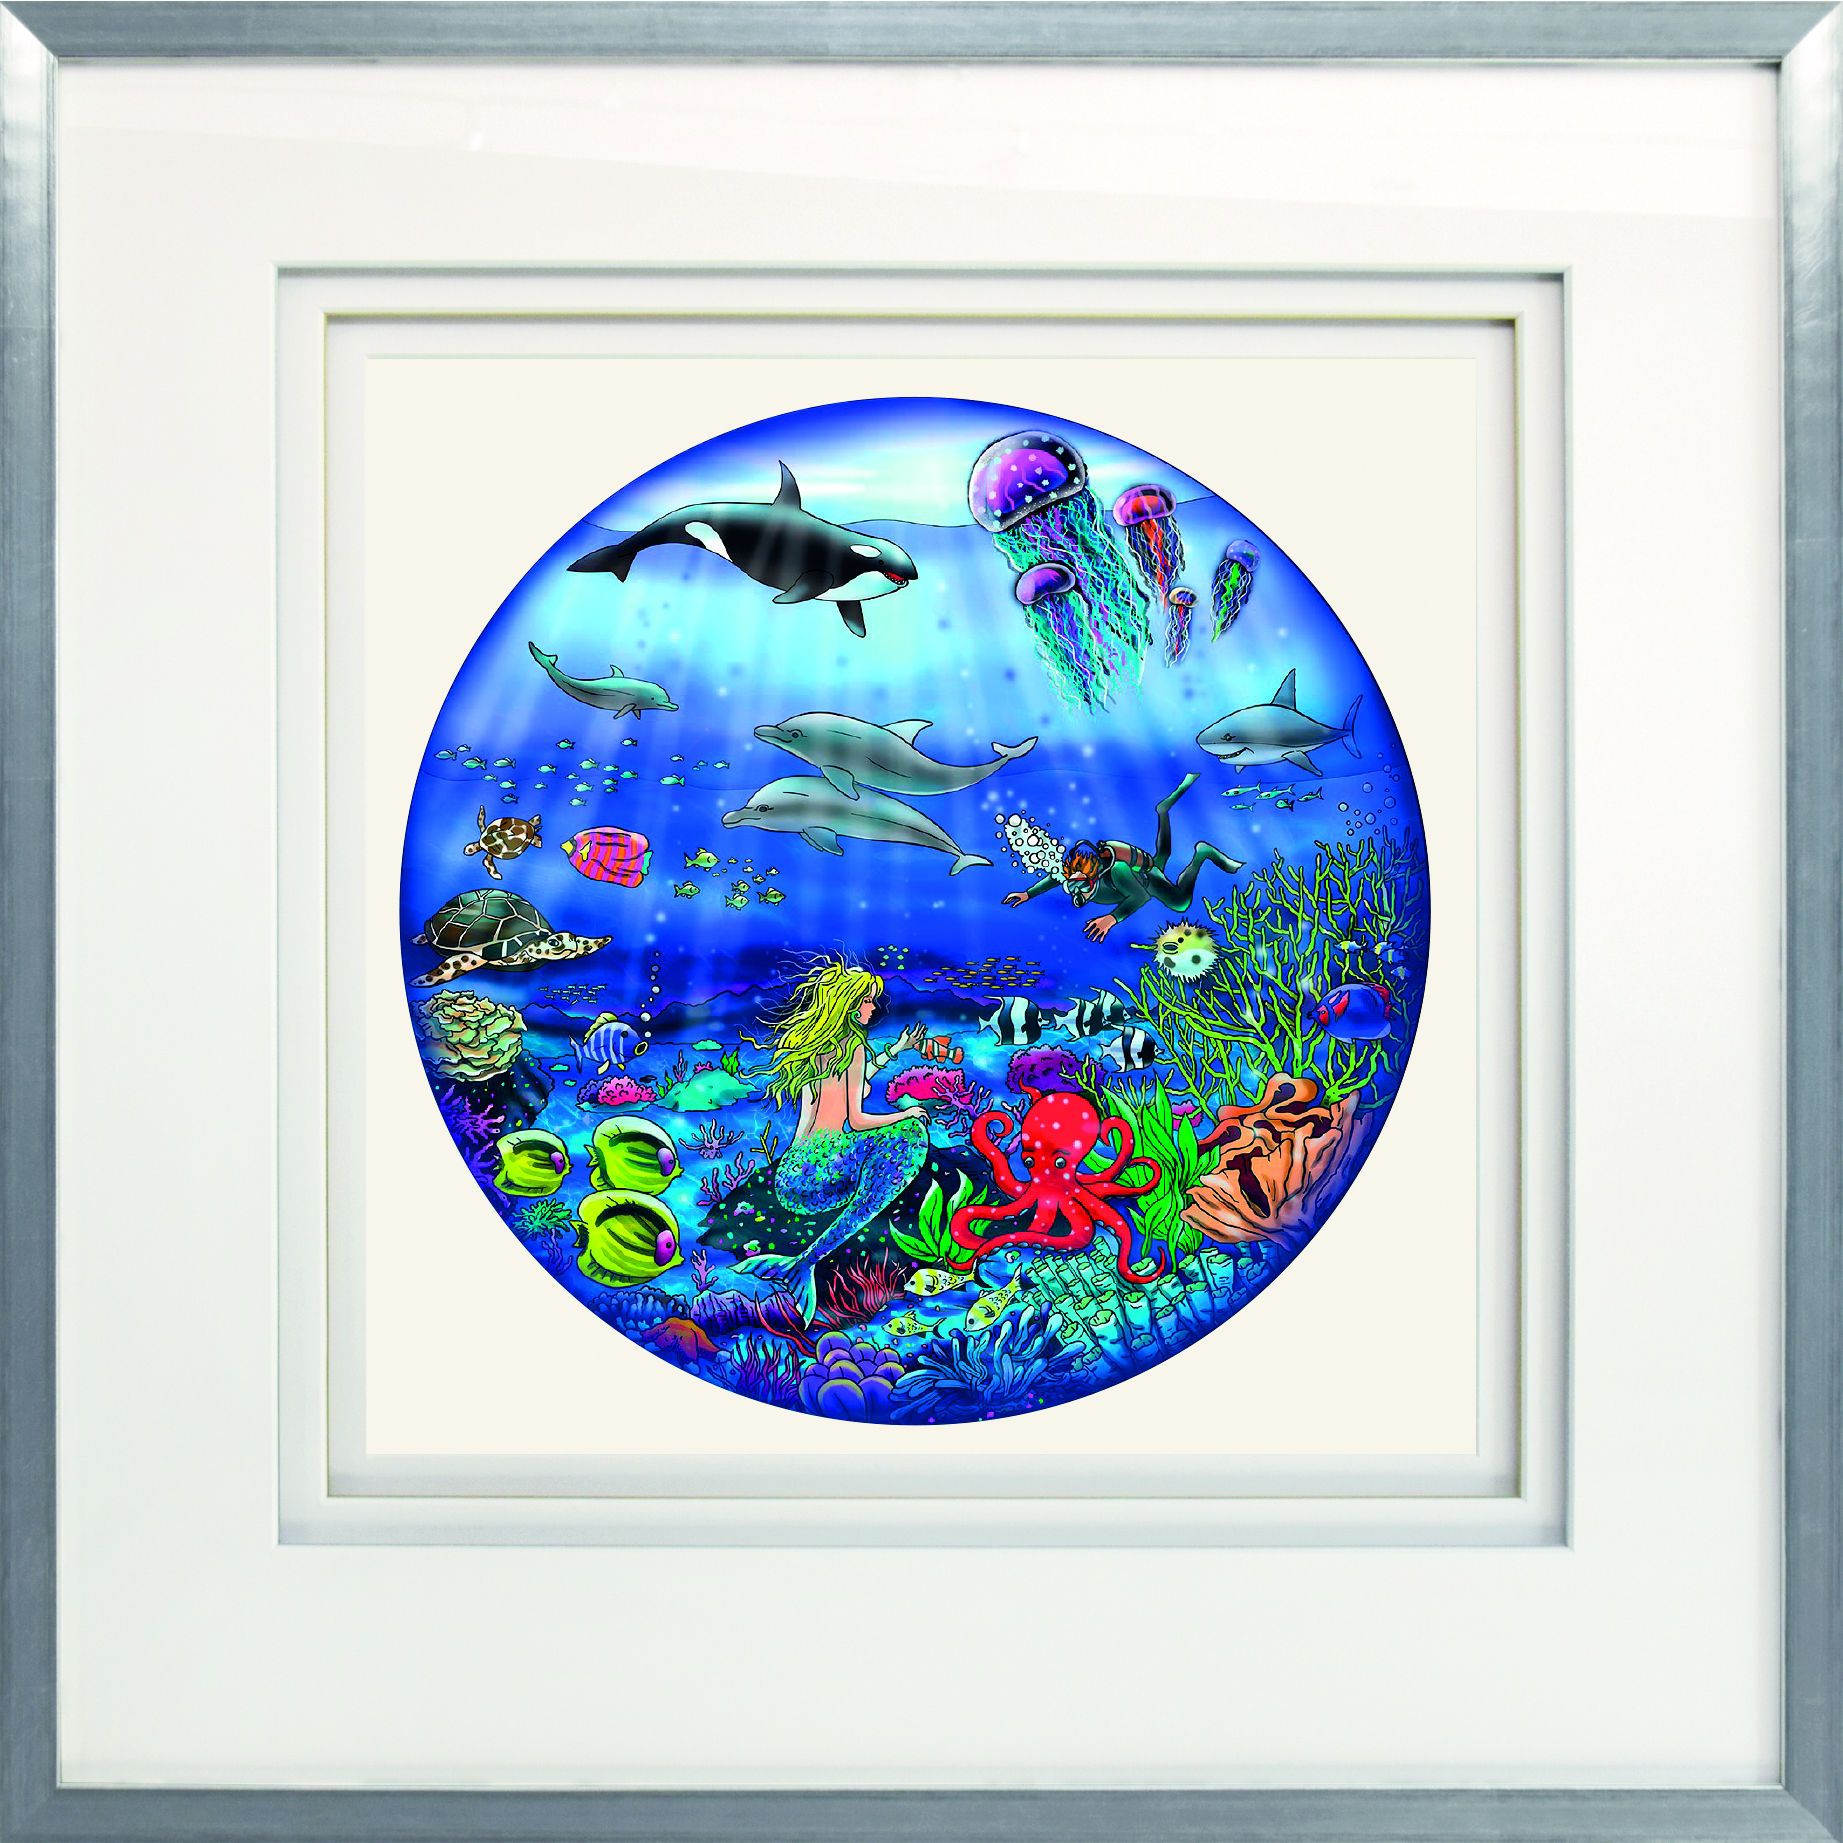 Charles Fazzino - See the Sea